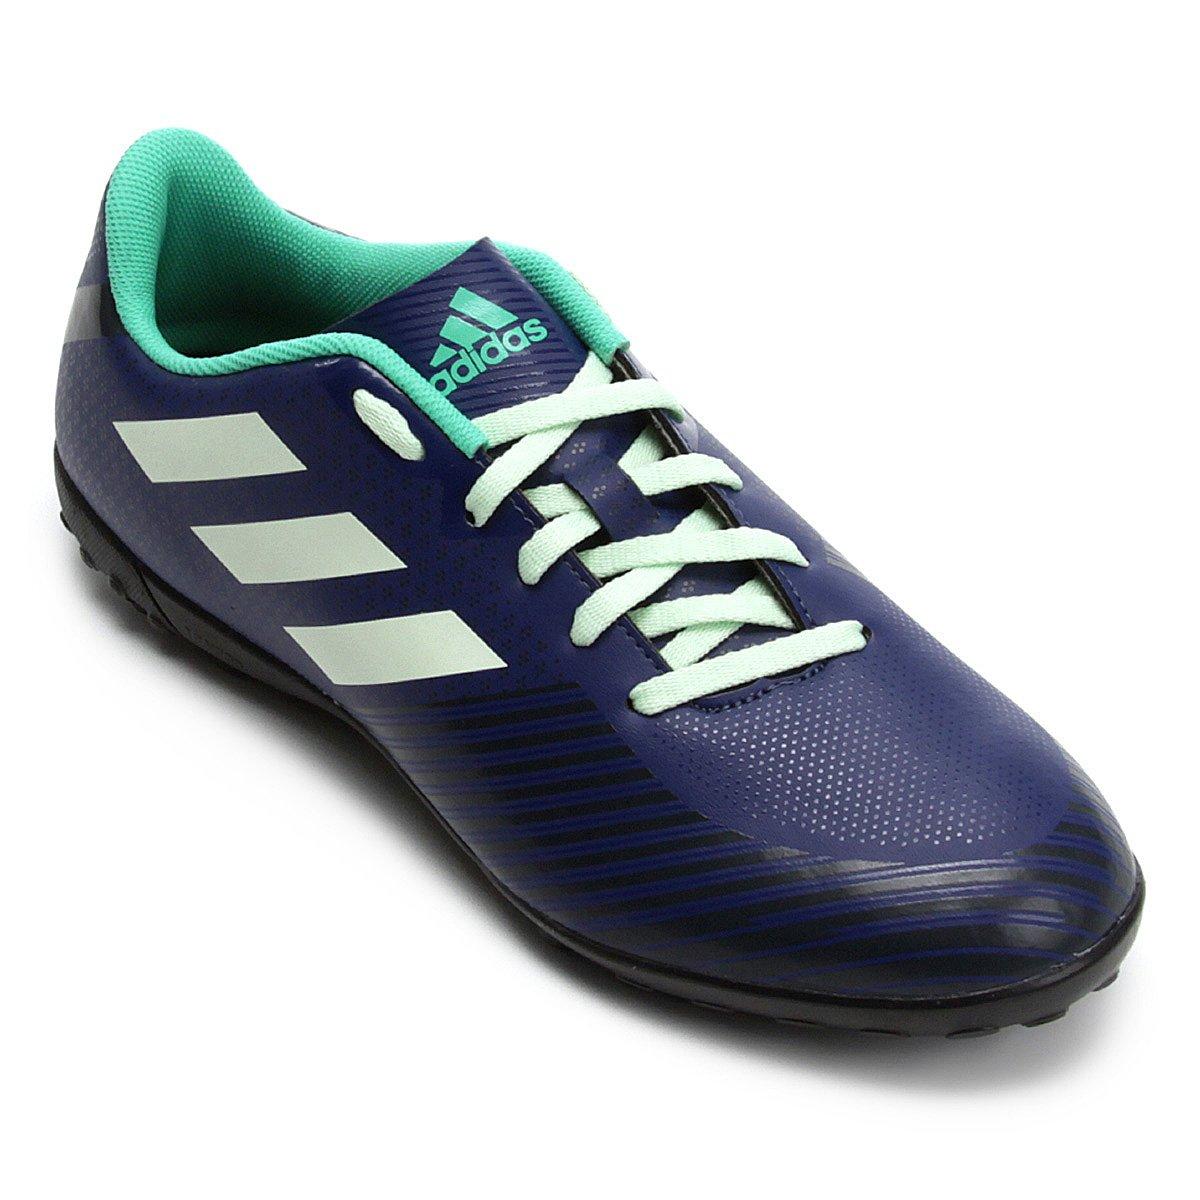 Chuteira Society Adidas Artilheira 18 TF - Azul e Verde - Compre ... 74a68aec6100b